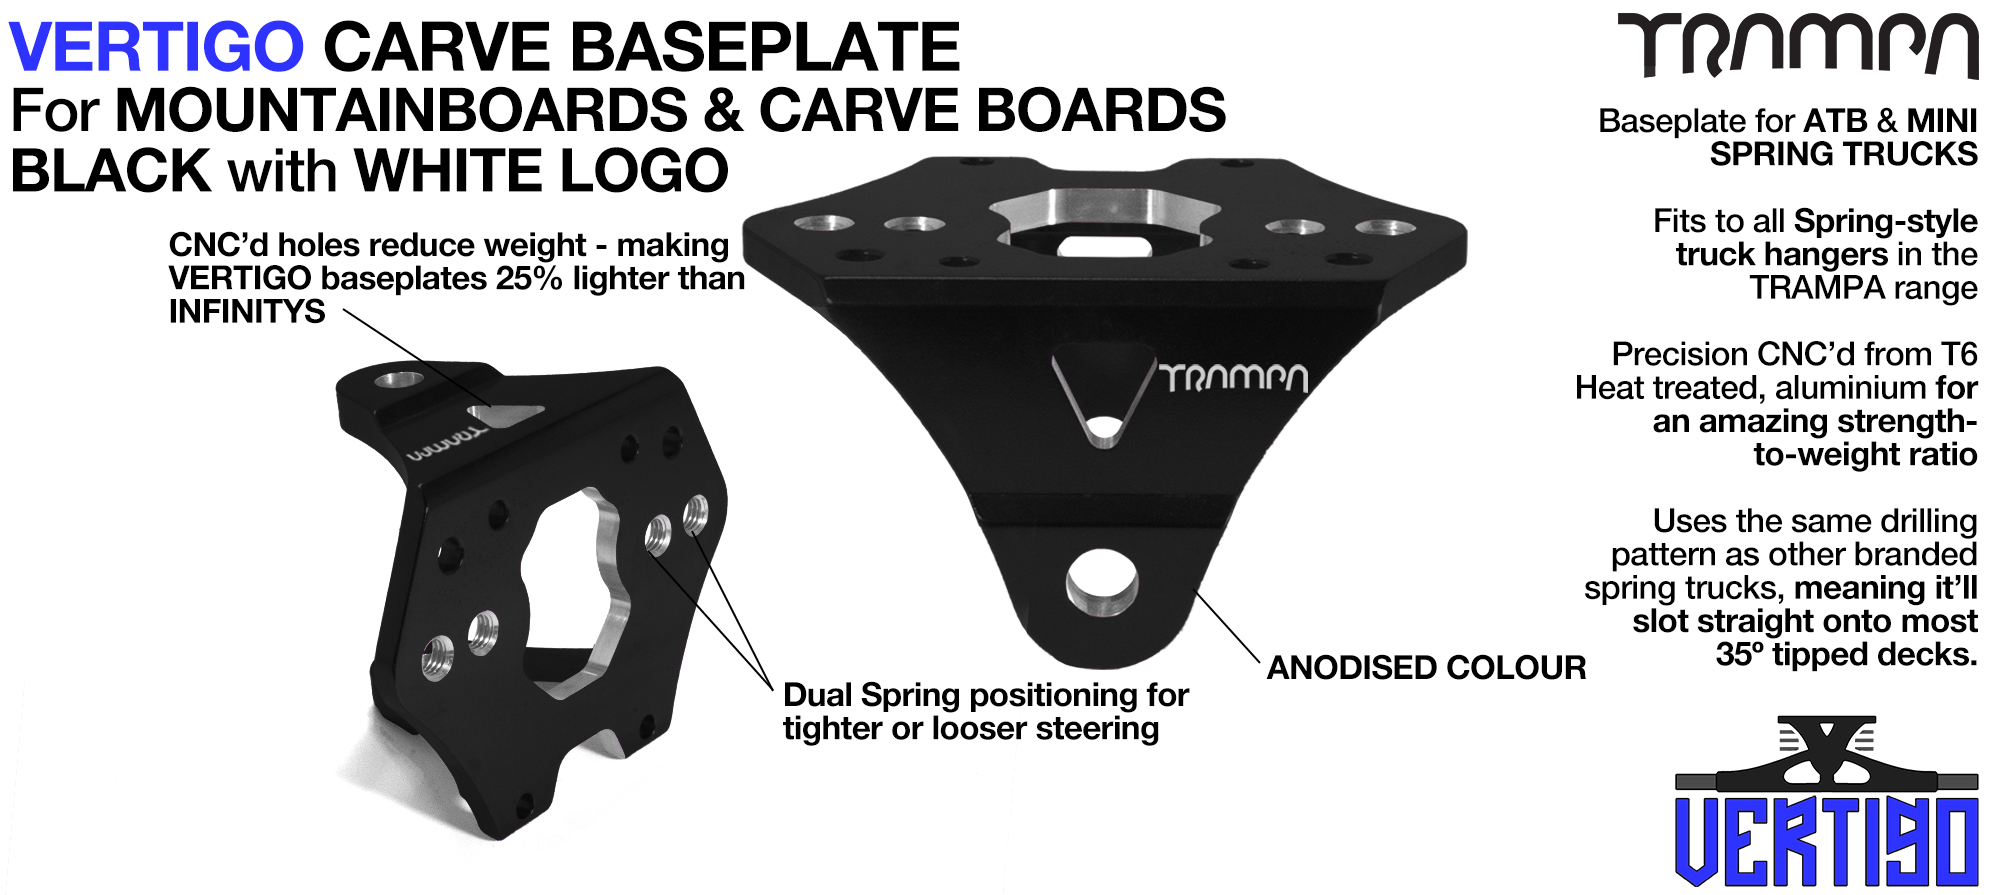 Carveboard VERTIGO Baseplate BLACK - T6 Aluminum Anodised - Silver logo